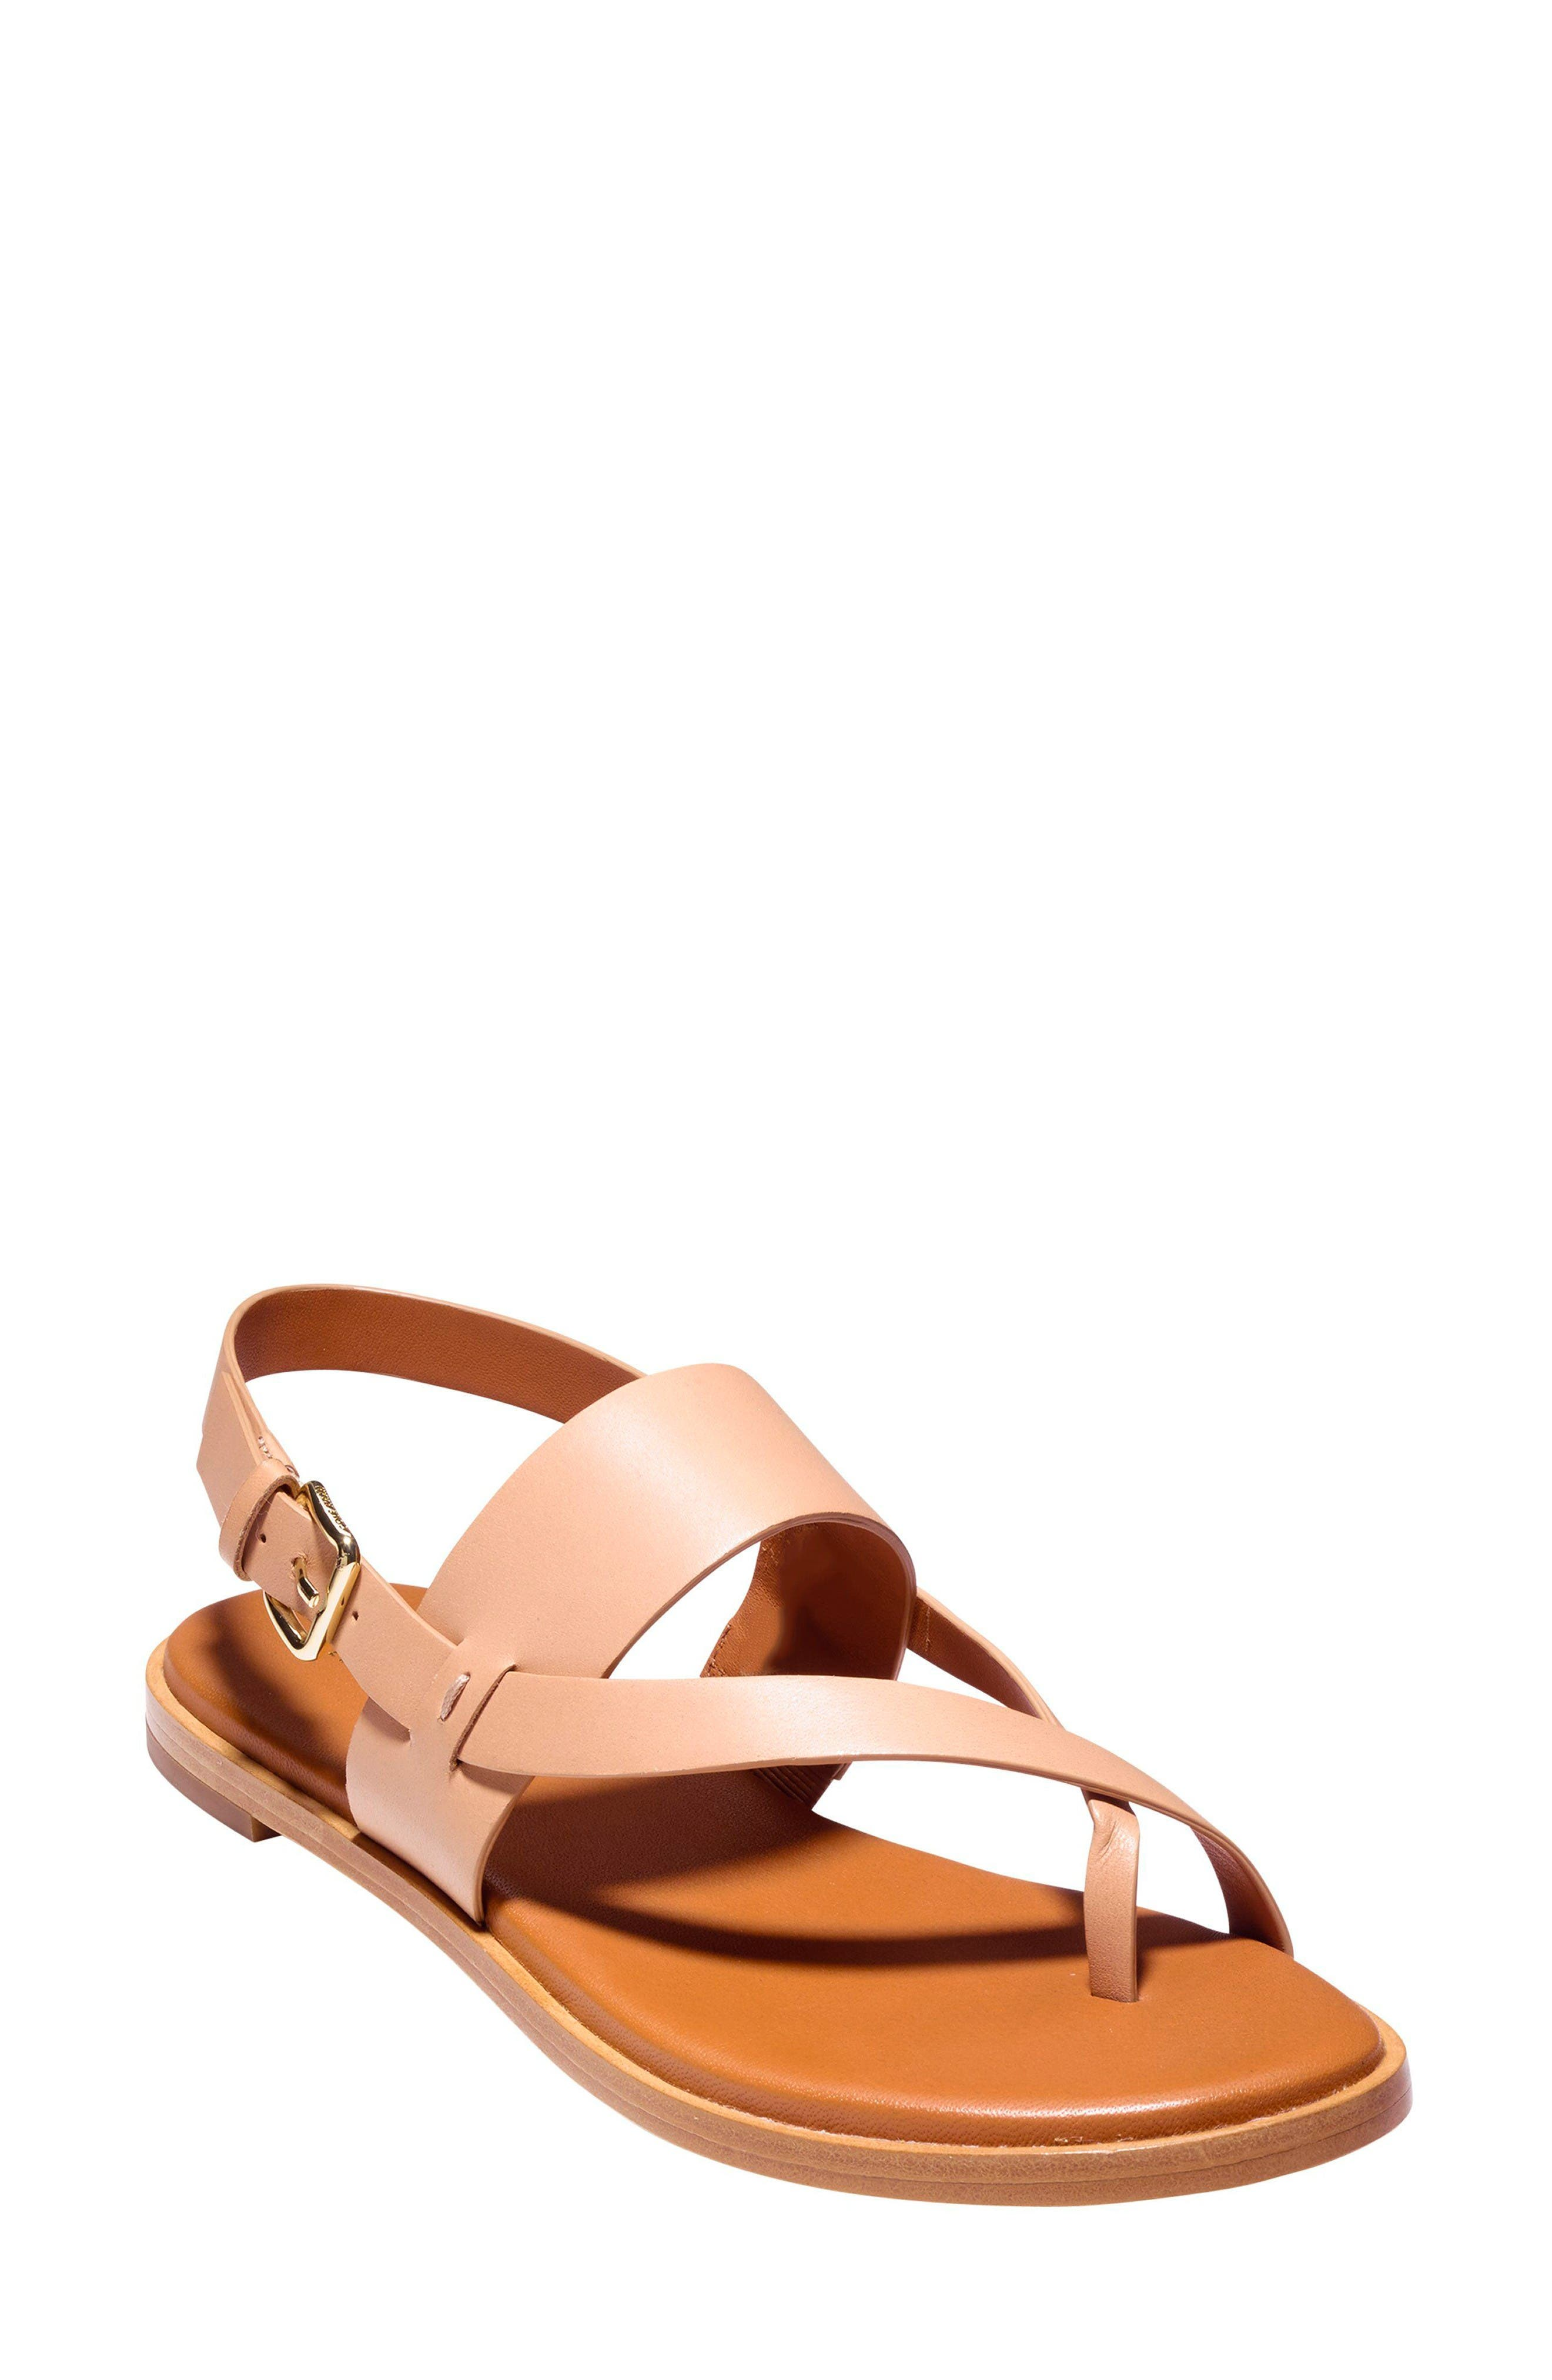 Anica Sandal,                             Main thumbnail 1, color,                             Sahara Leather